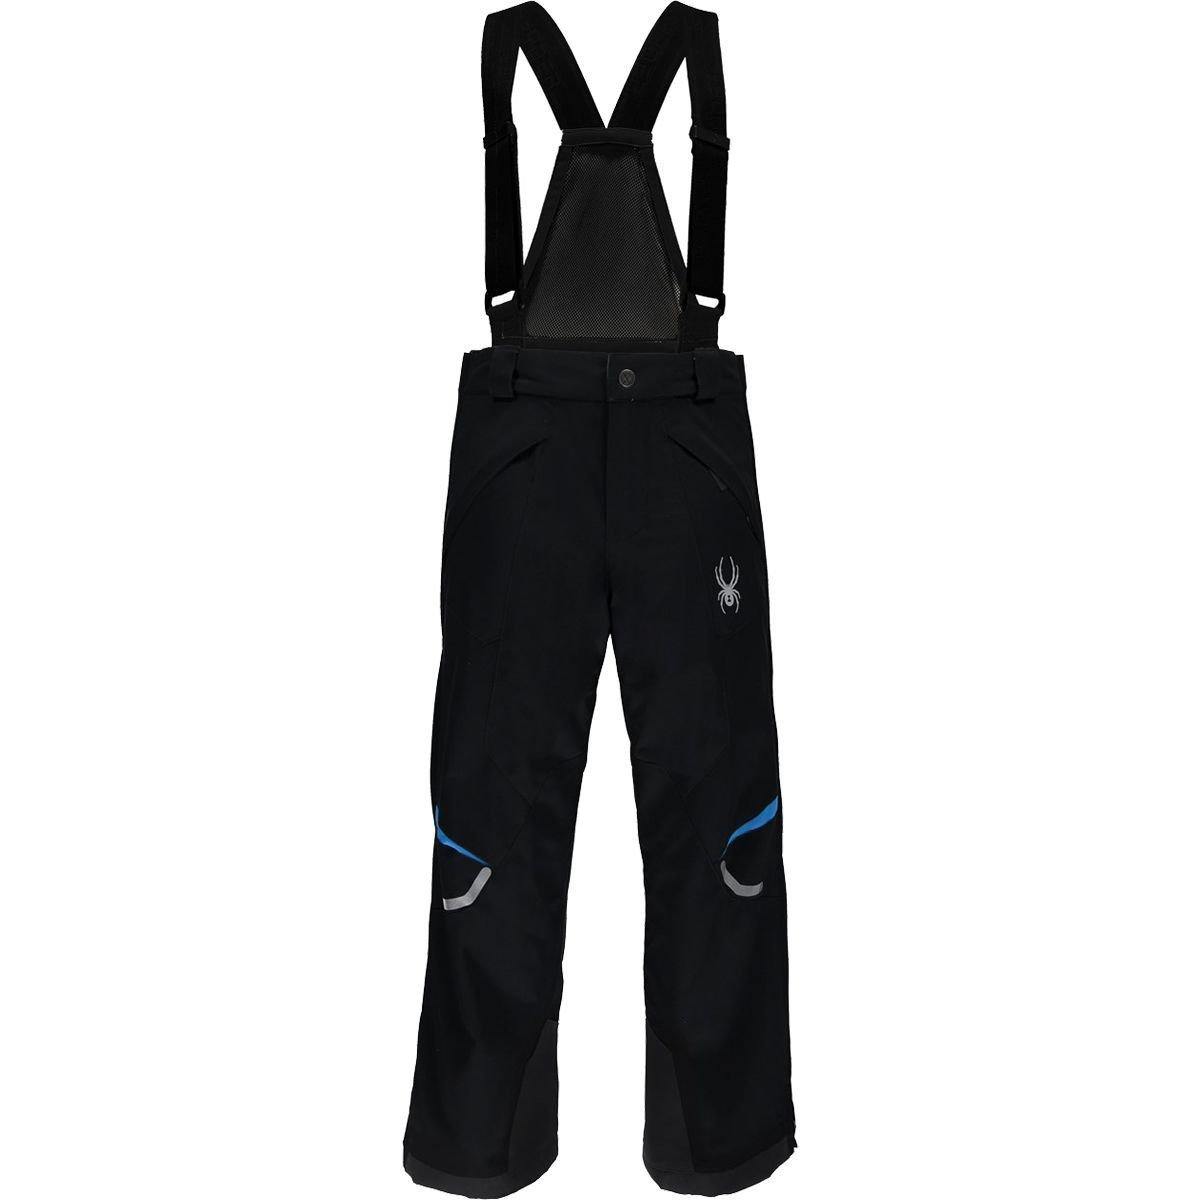 Spyder Kids Boy's Force Pants (Big Kids) Black/French Blue 18